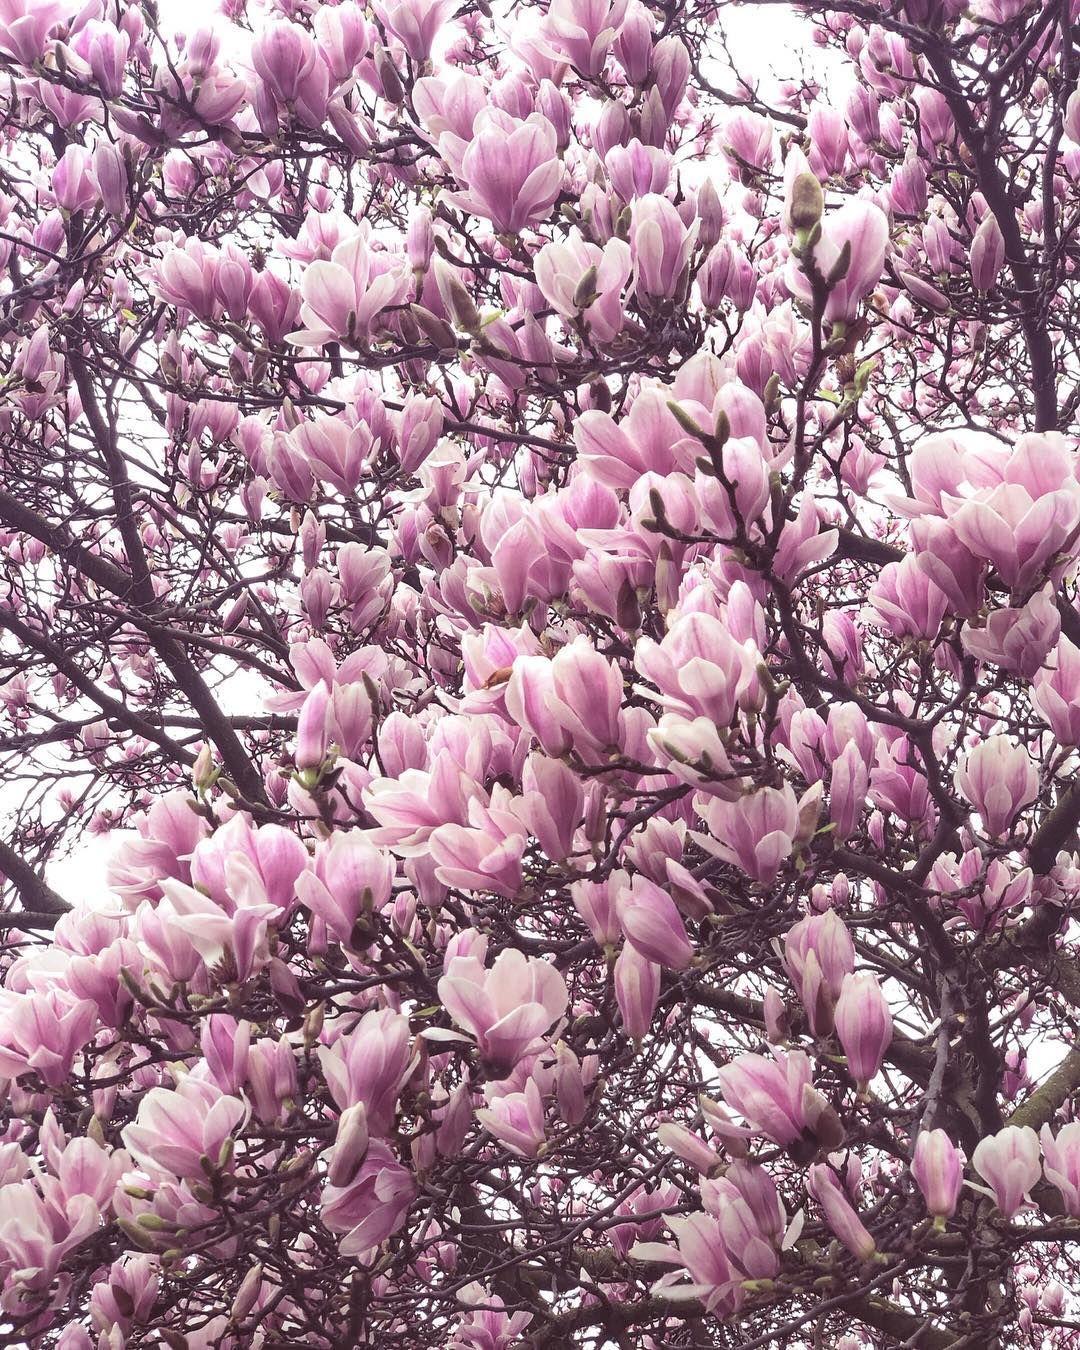 Magnolia In Bloom London England By Miranda Jane Mills Mirandasnotebook On Instagram With Images Beautiful Blooms Instagram Bloom